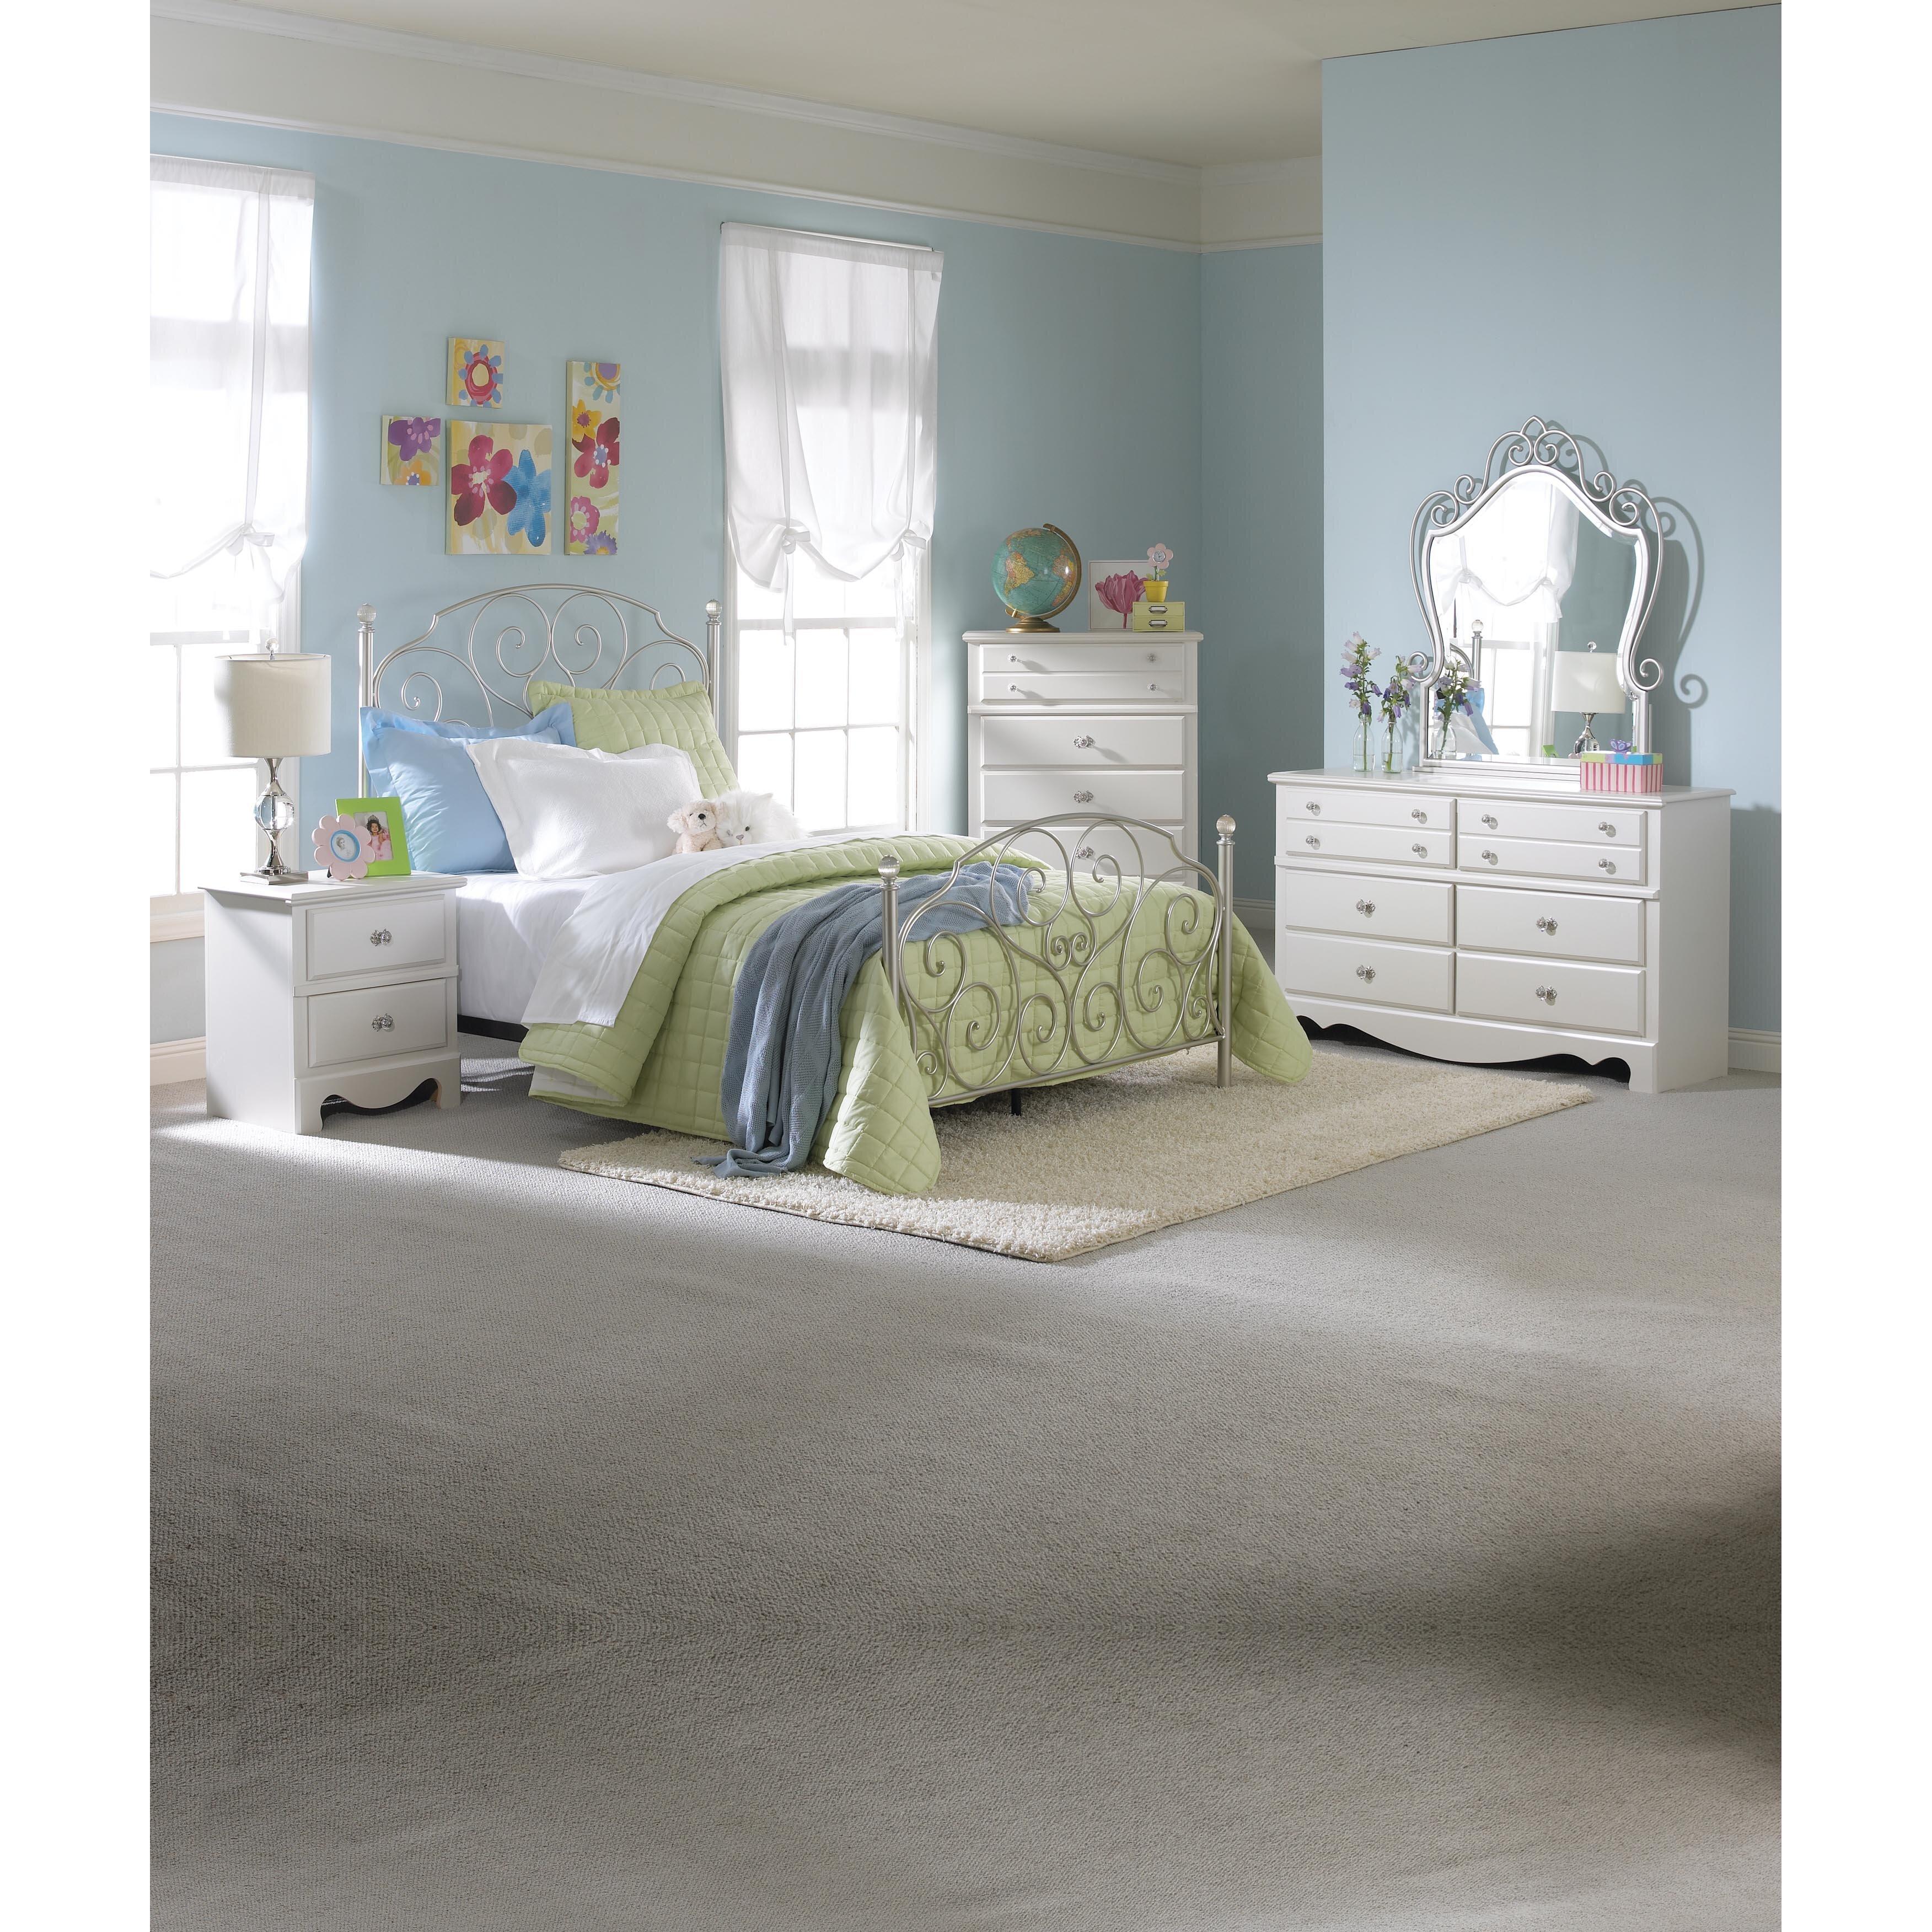 gabriella panel bedroom set - Kids Bedroom